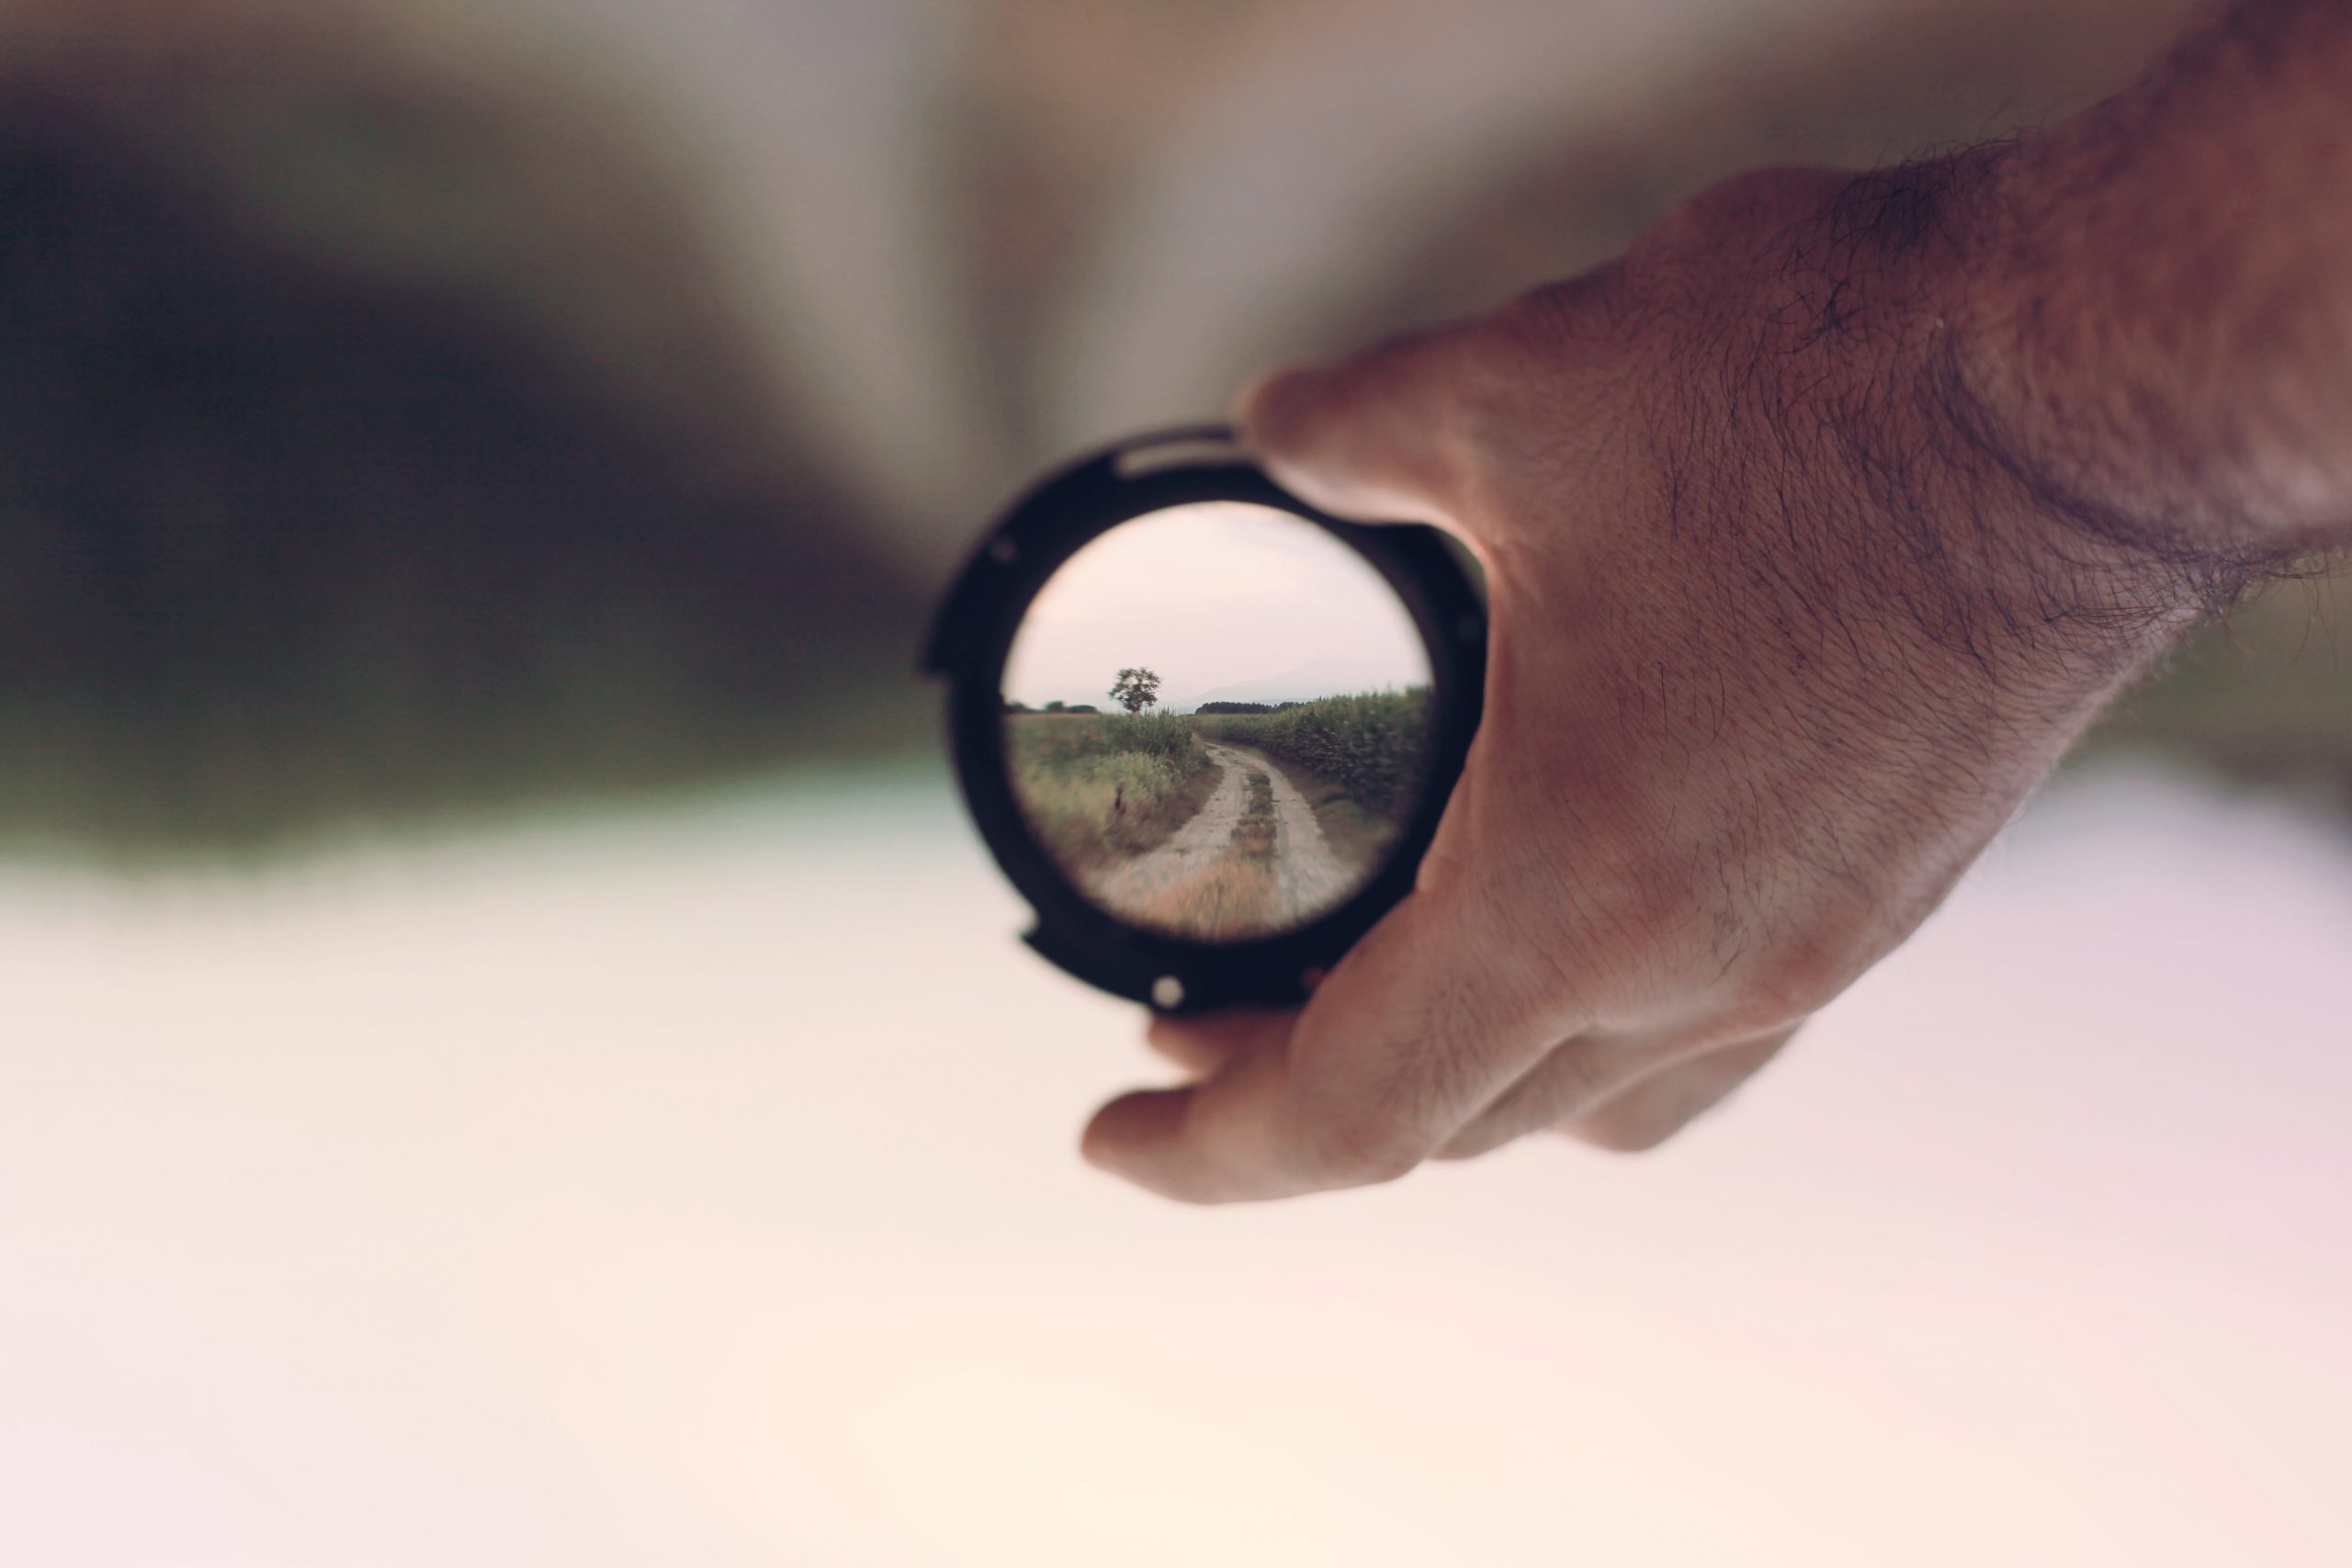 Shift Your Focus